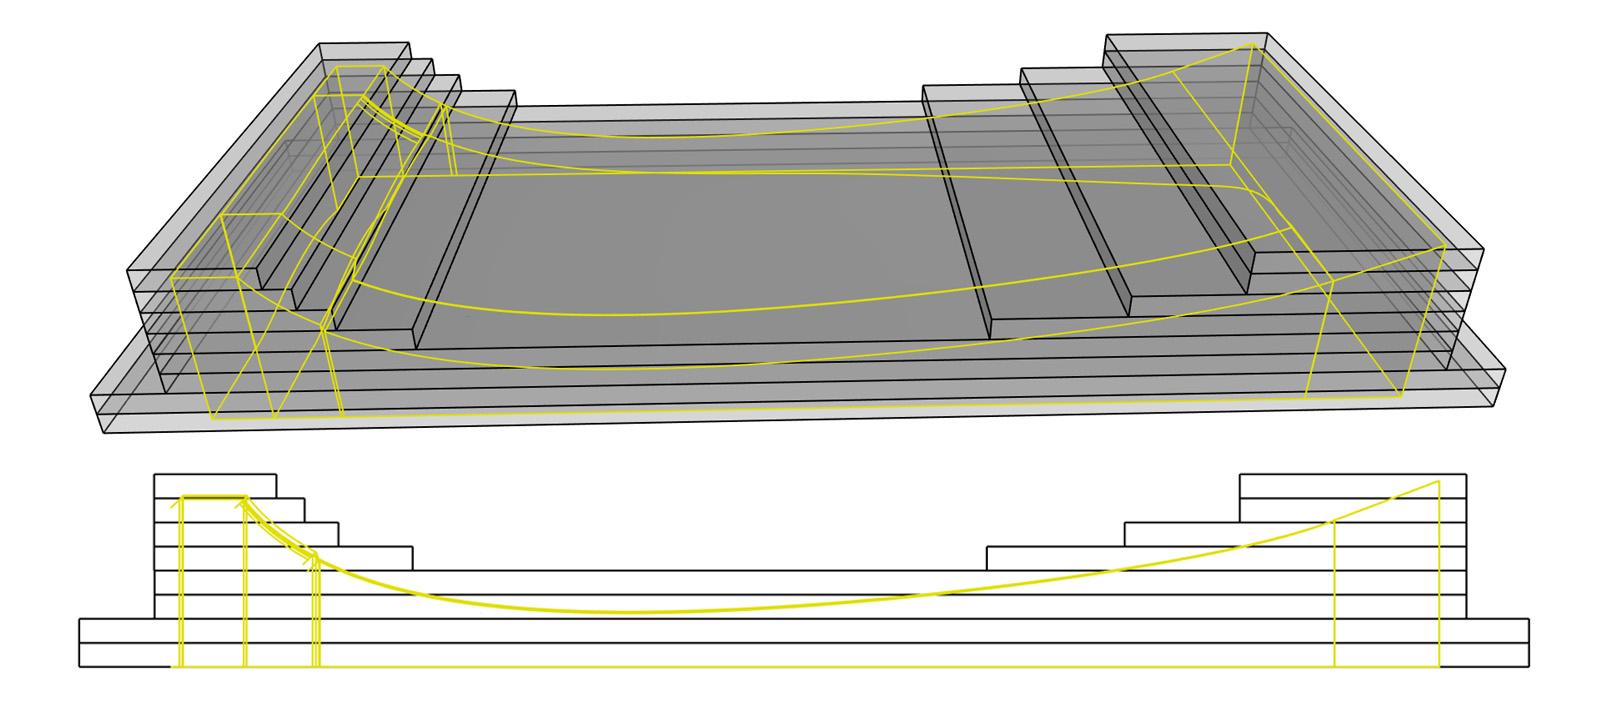 demo block layout.jpg